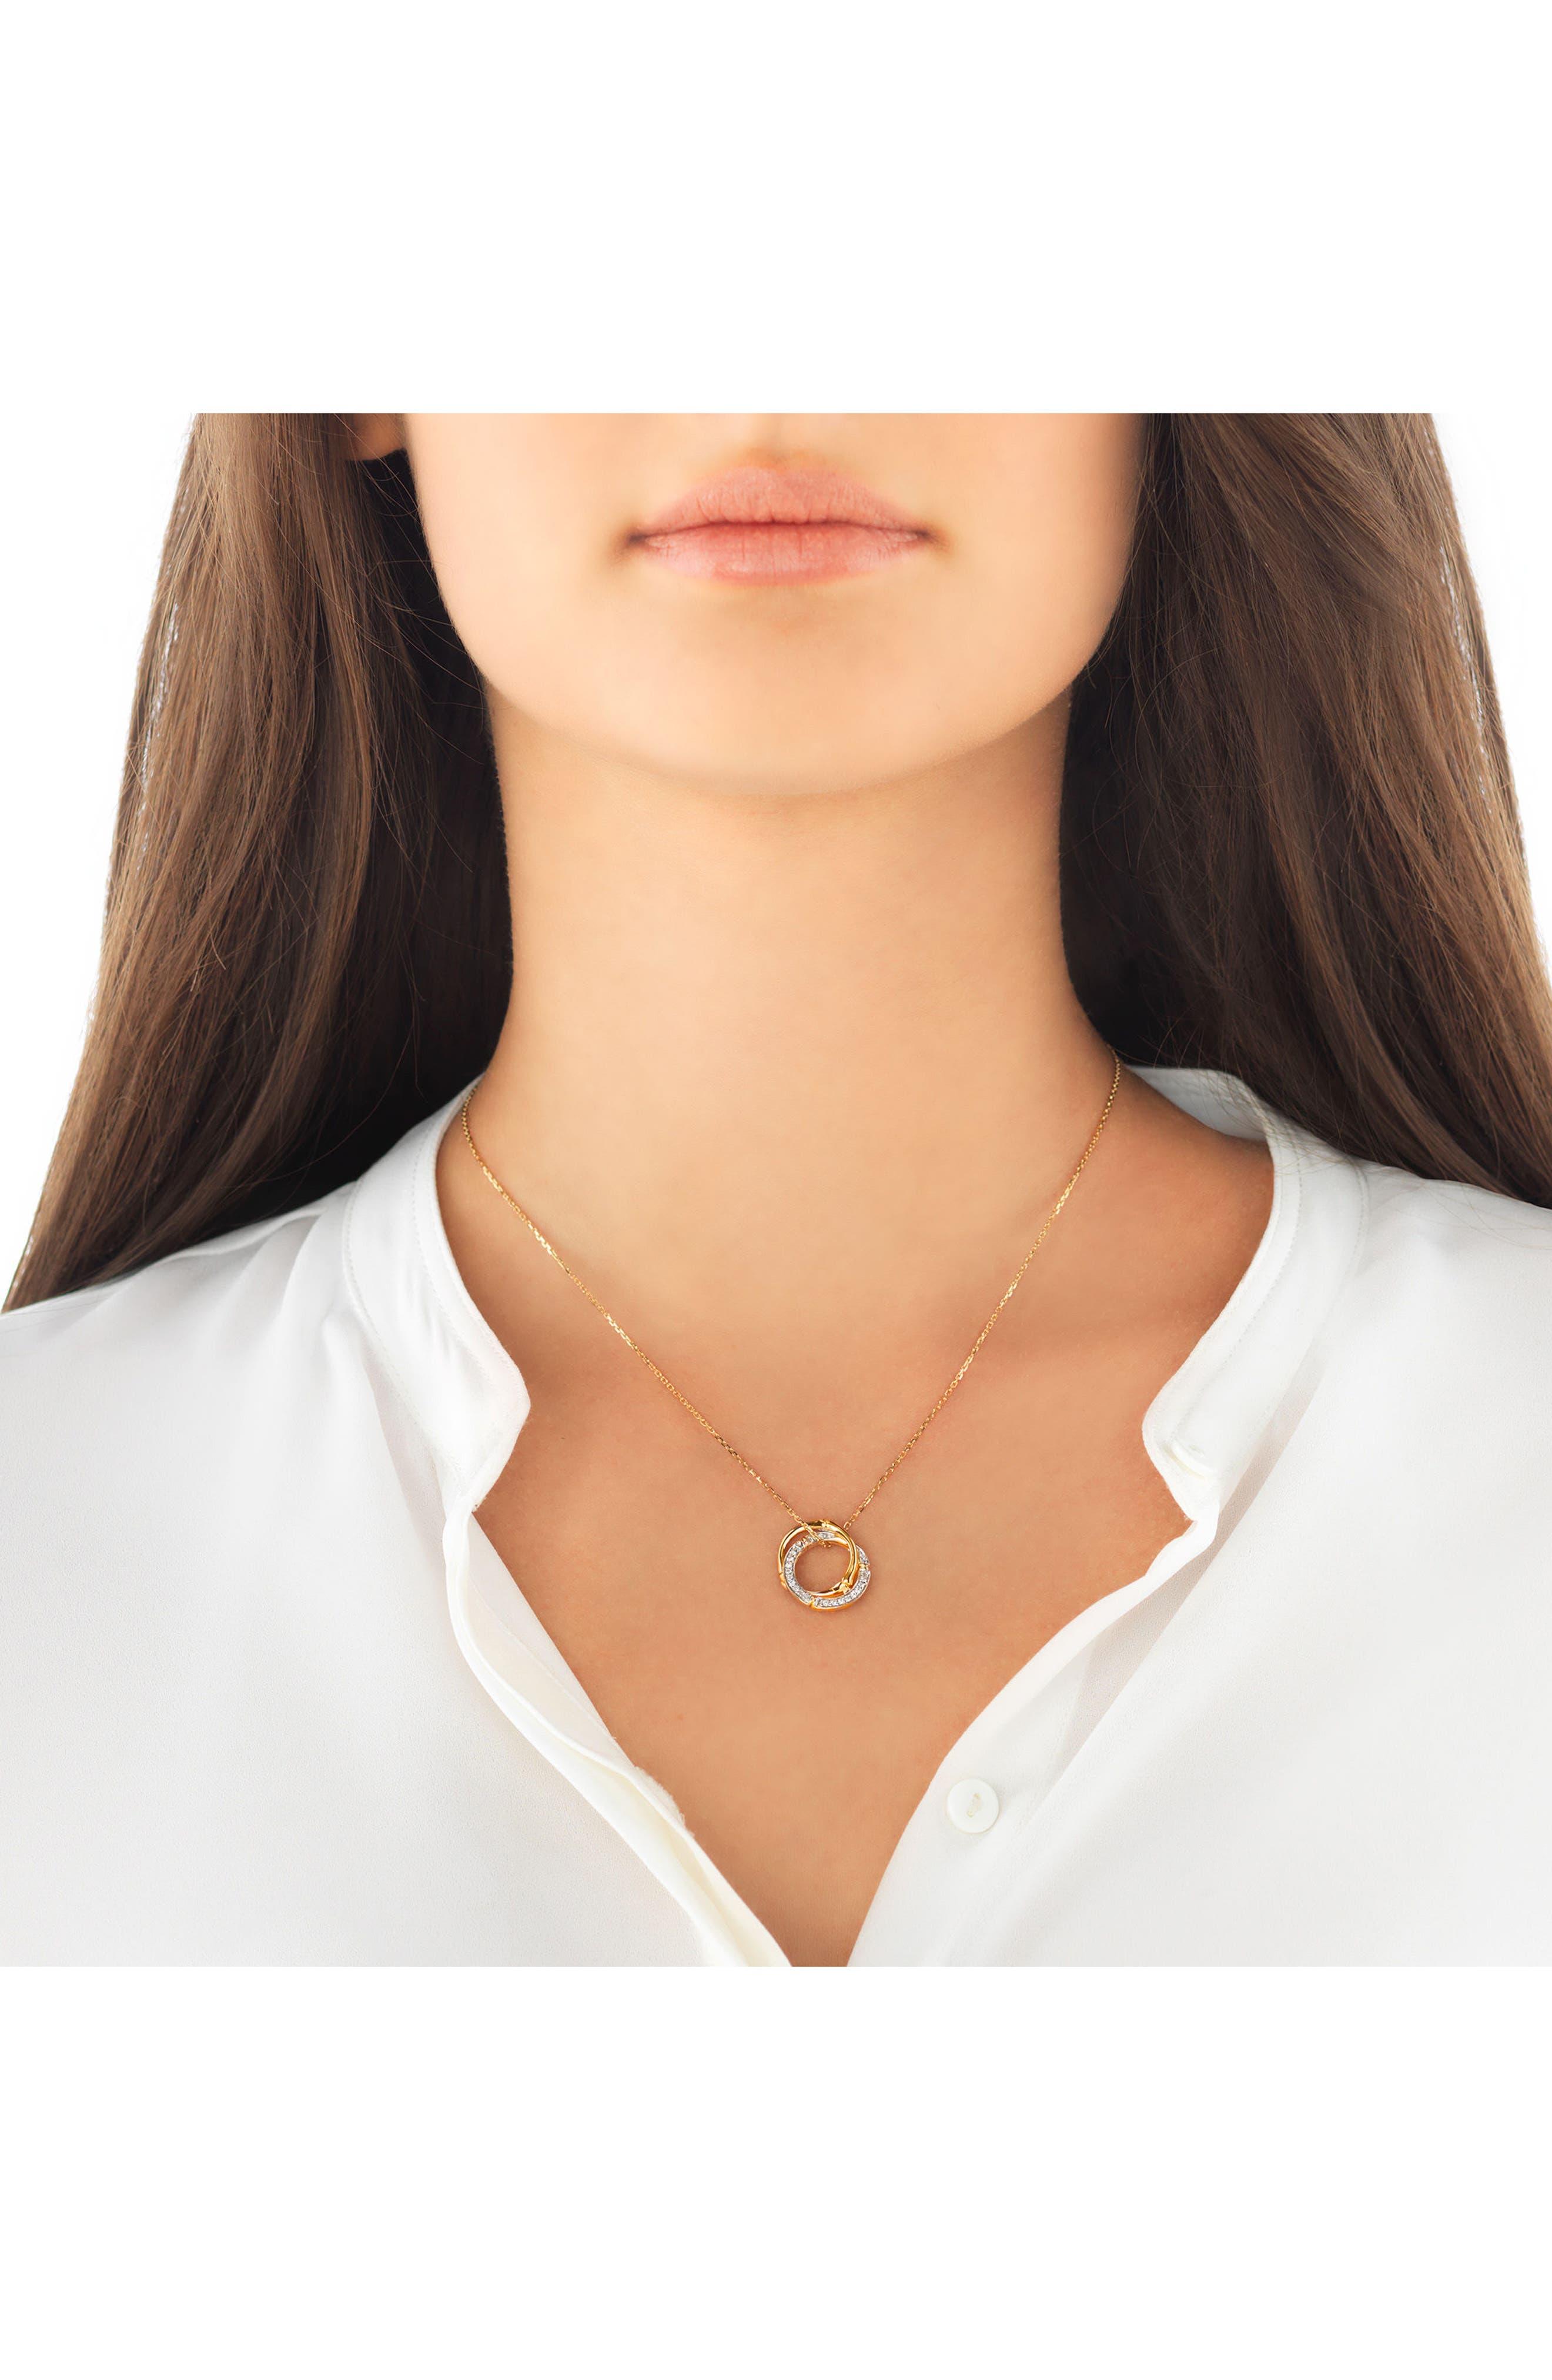 Bamboo Diamond & 18k Gold Pendant Necklace,                             Alternate thumbnail 2, color,                             Gold